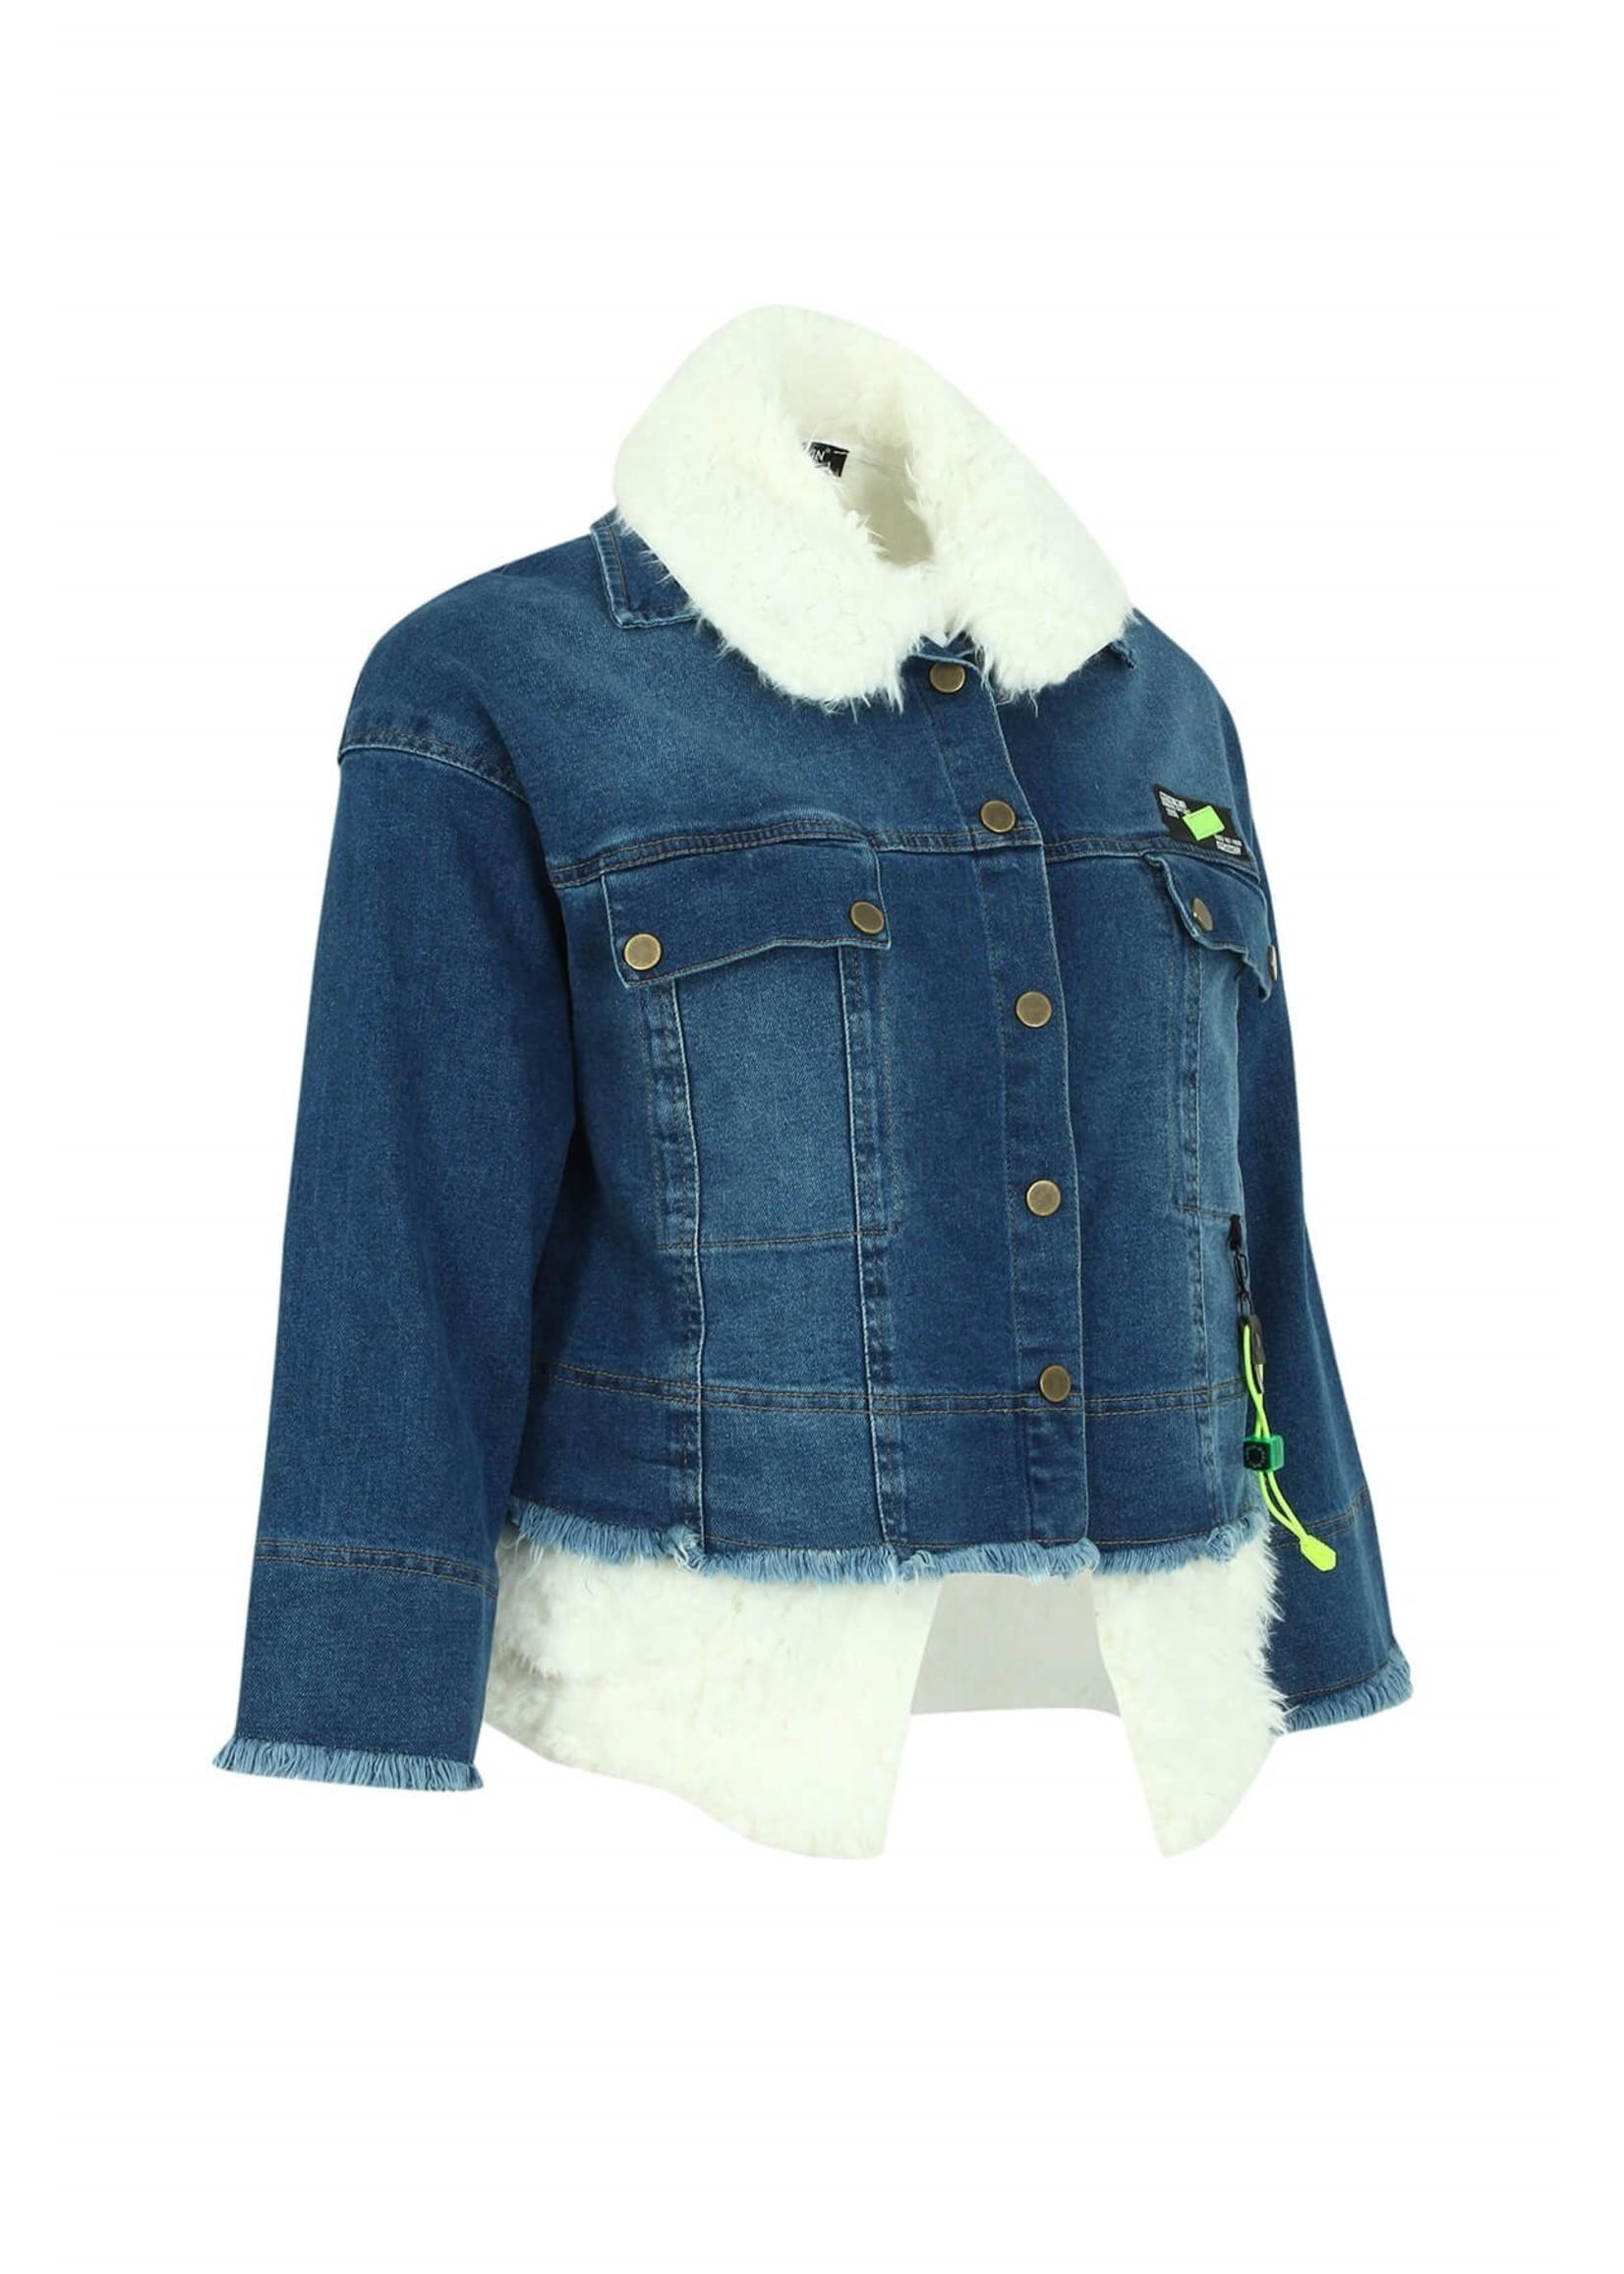 STEPPINOUT b1479  jean  fur line jacket